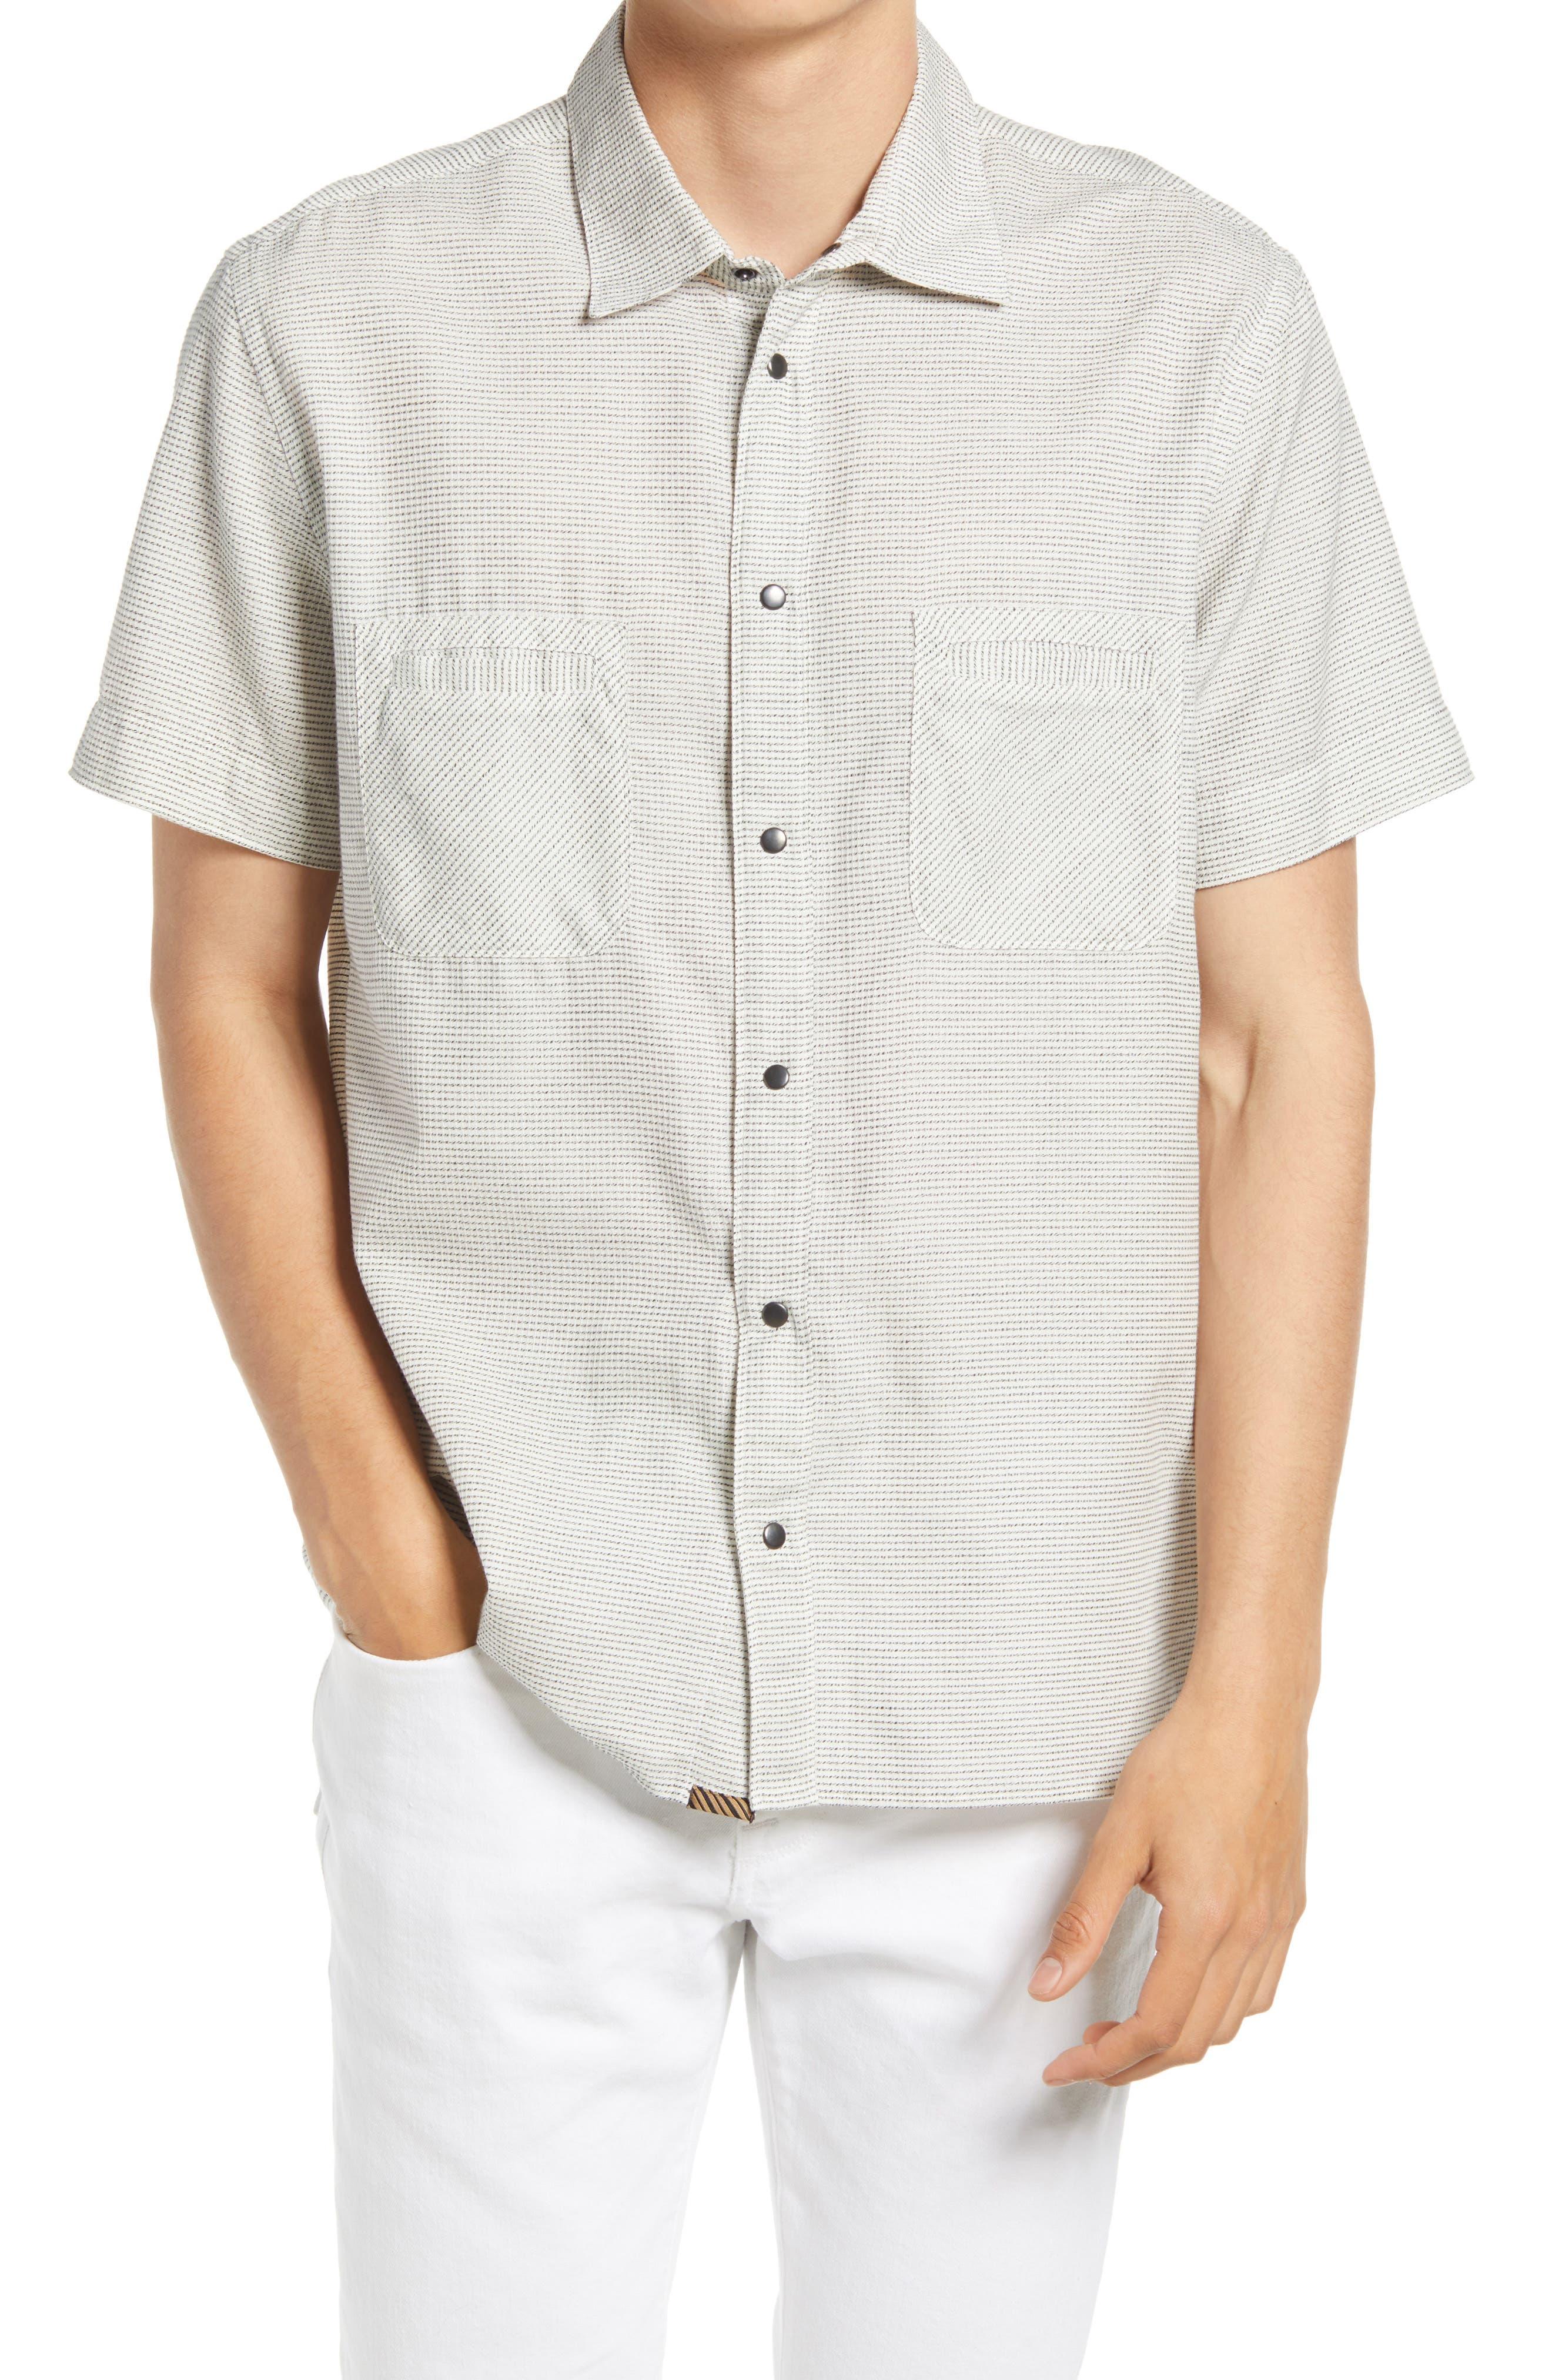 Tuscumbia Short Sleeve Cotton Button-Down Shirt